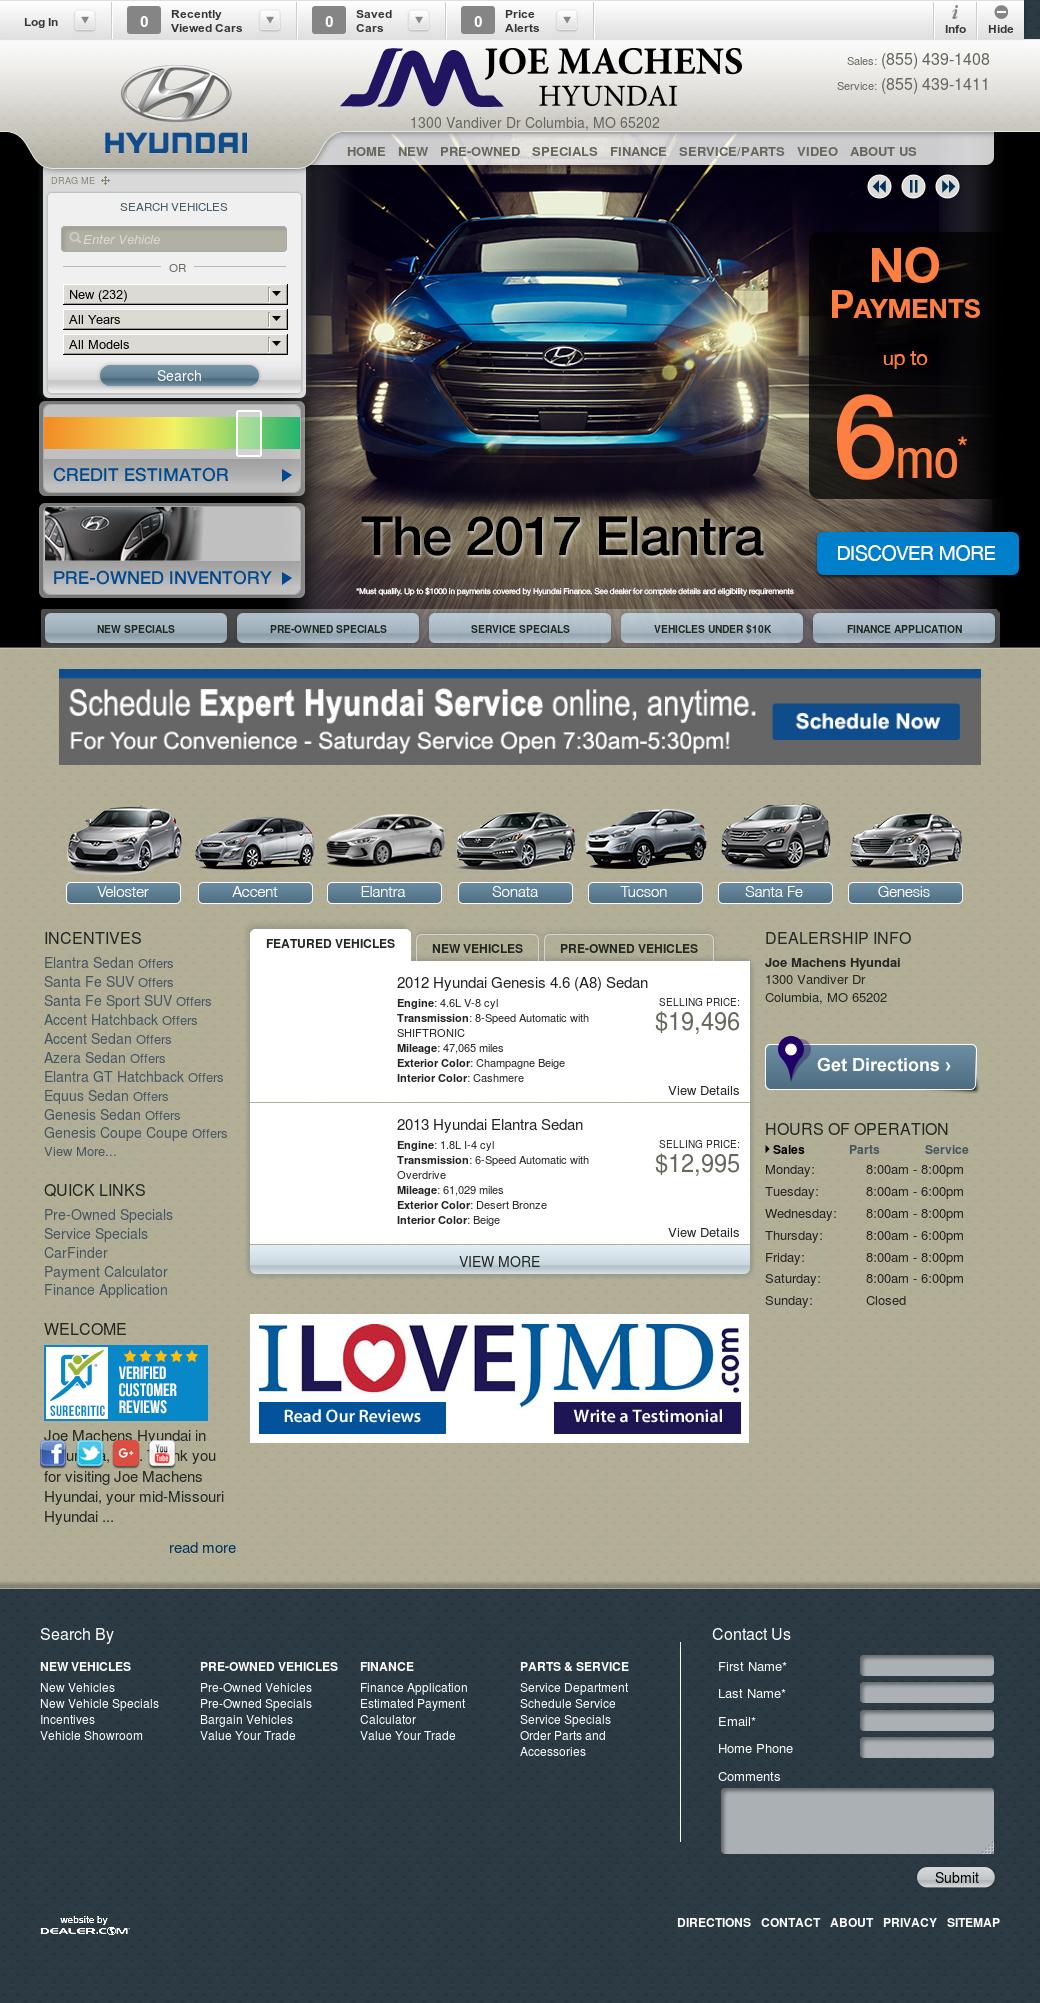 Joe Machens Hyundai Competitors Revenue And Employees Owler 1 8l Engine Company Profile